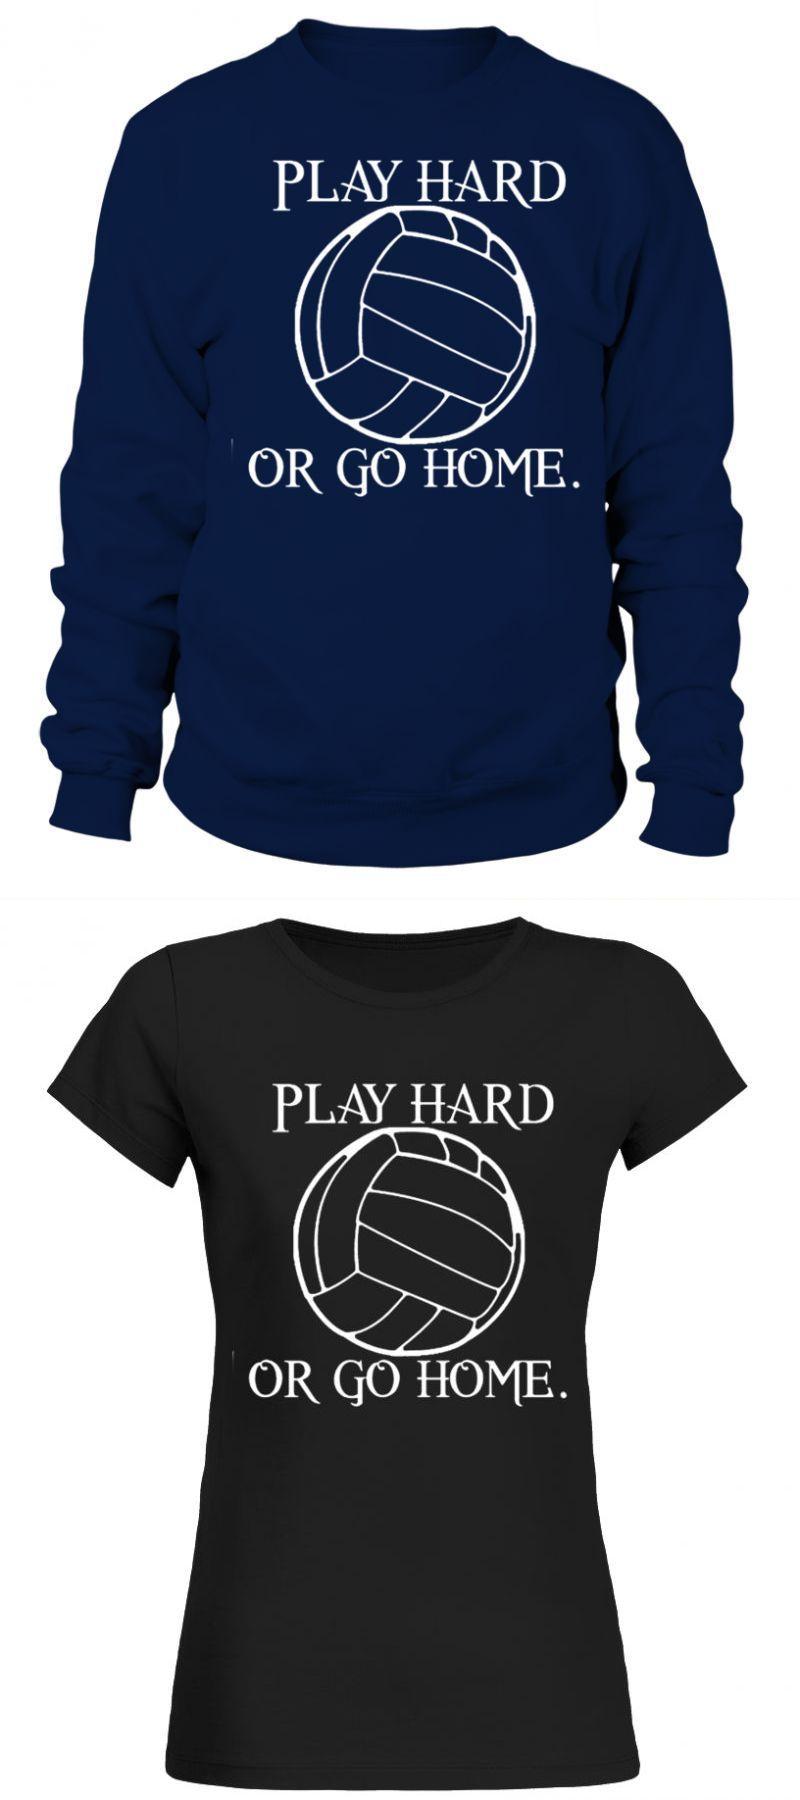 Volleyball T Shirt Design Templates Play Hard Volleyball T Shirt Volleyball T S Volleyball T Shirt Designs Basketball T Shirt Designs Volleyball Tshirt Designs